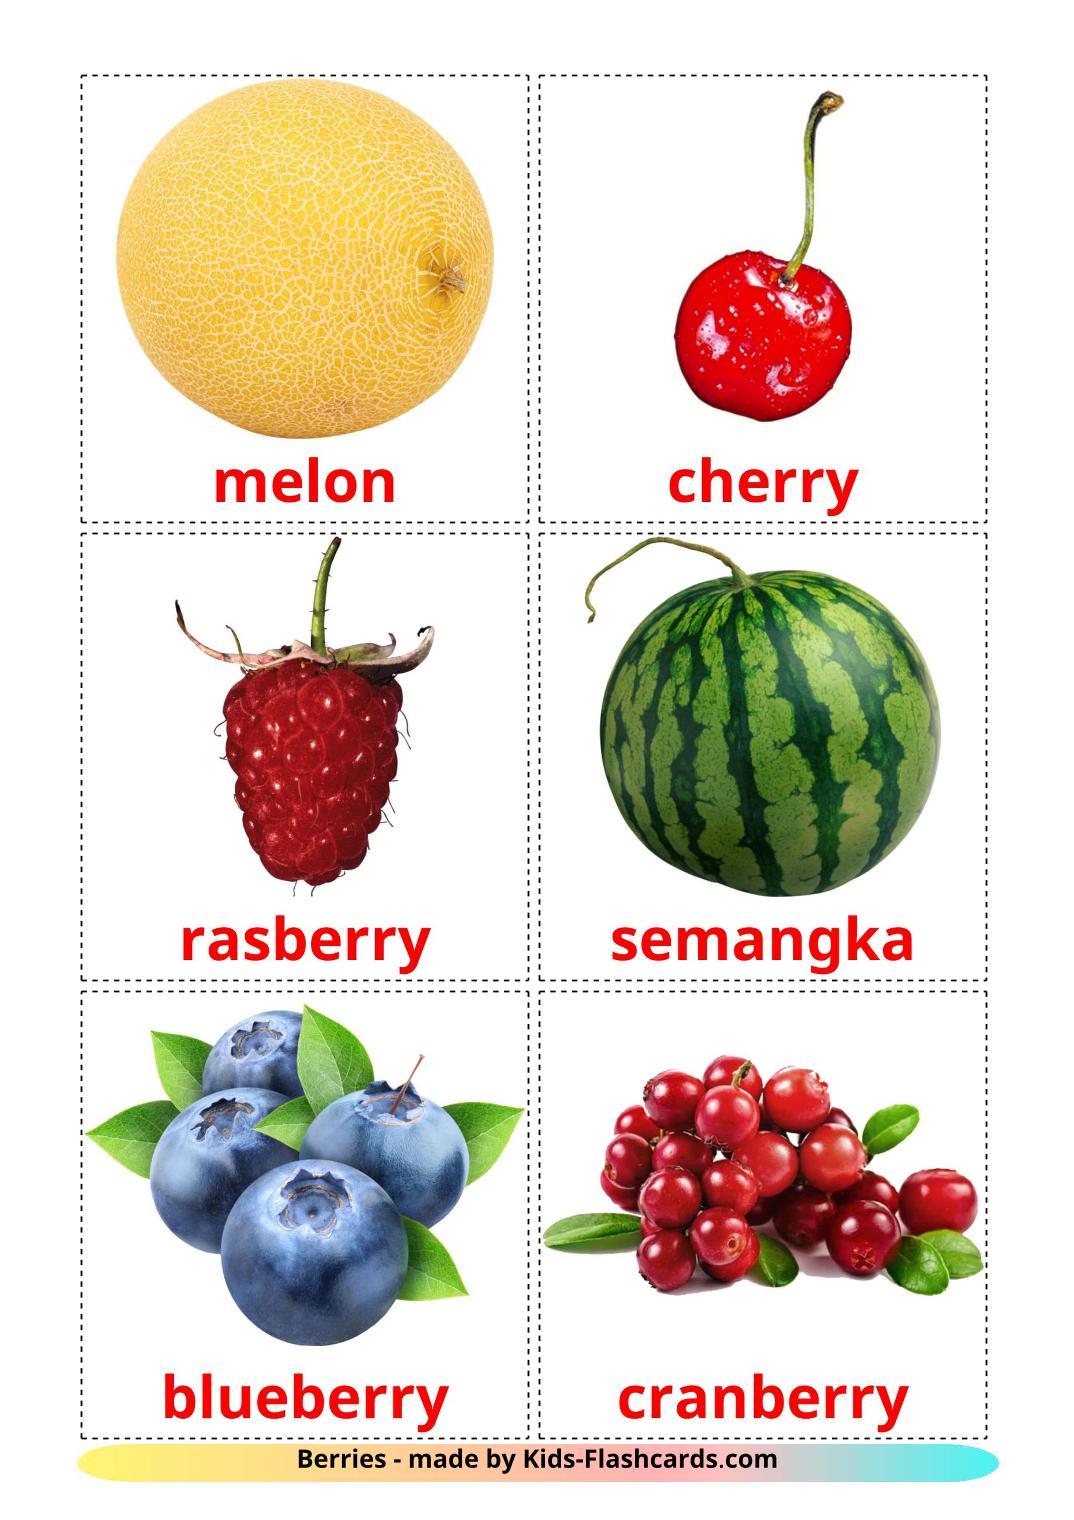 Berries - 11 Free Printable indonesian Flashcards